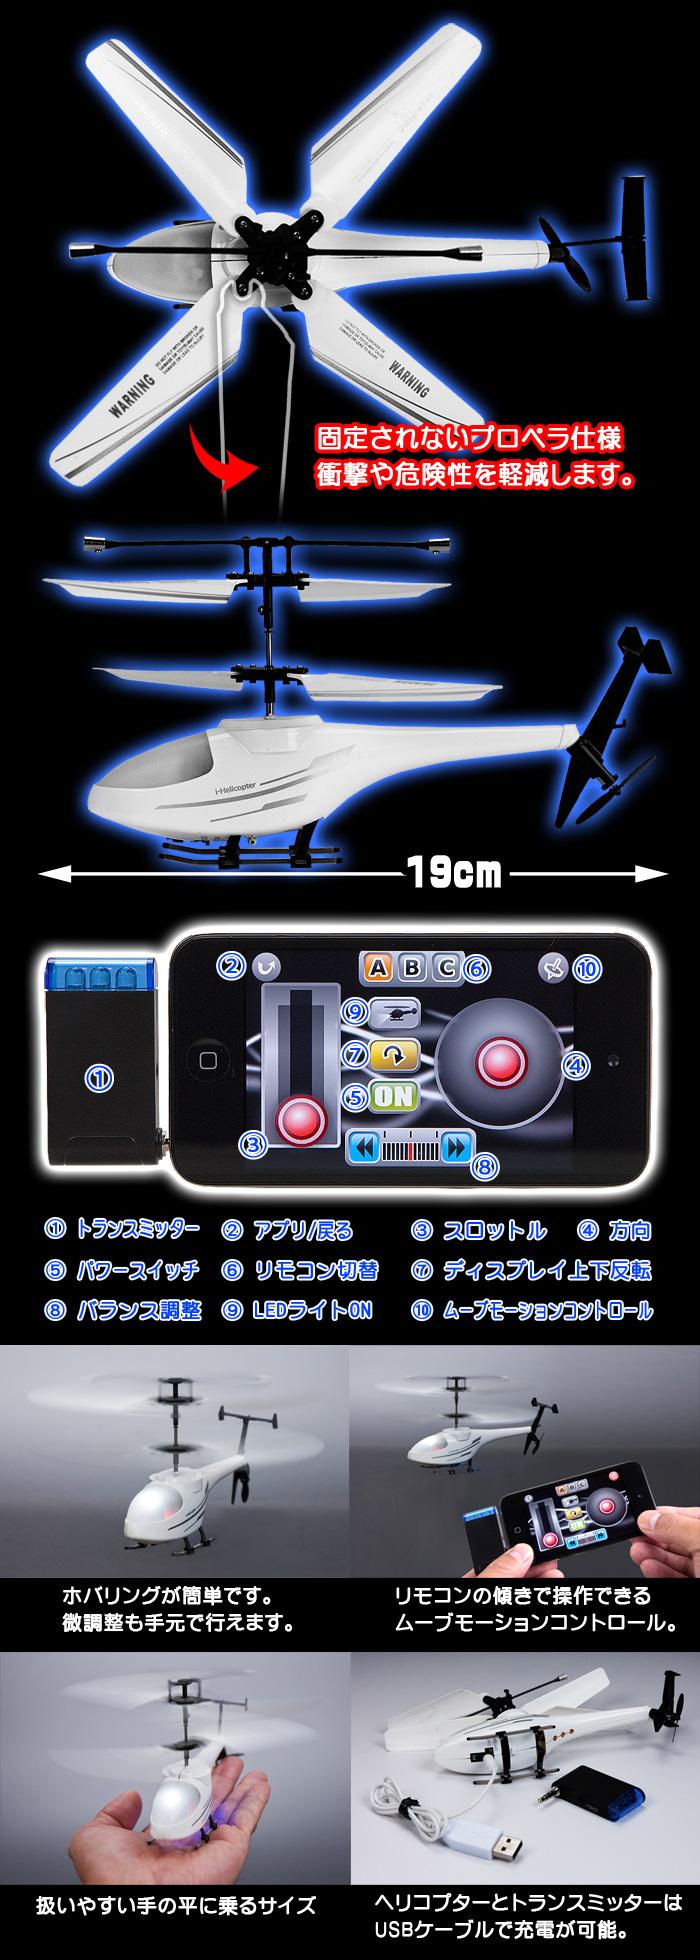 iPhone・iPod・iPadで操作ができる【i-helicopter】 アイ-ヘリコプター